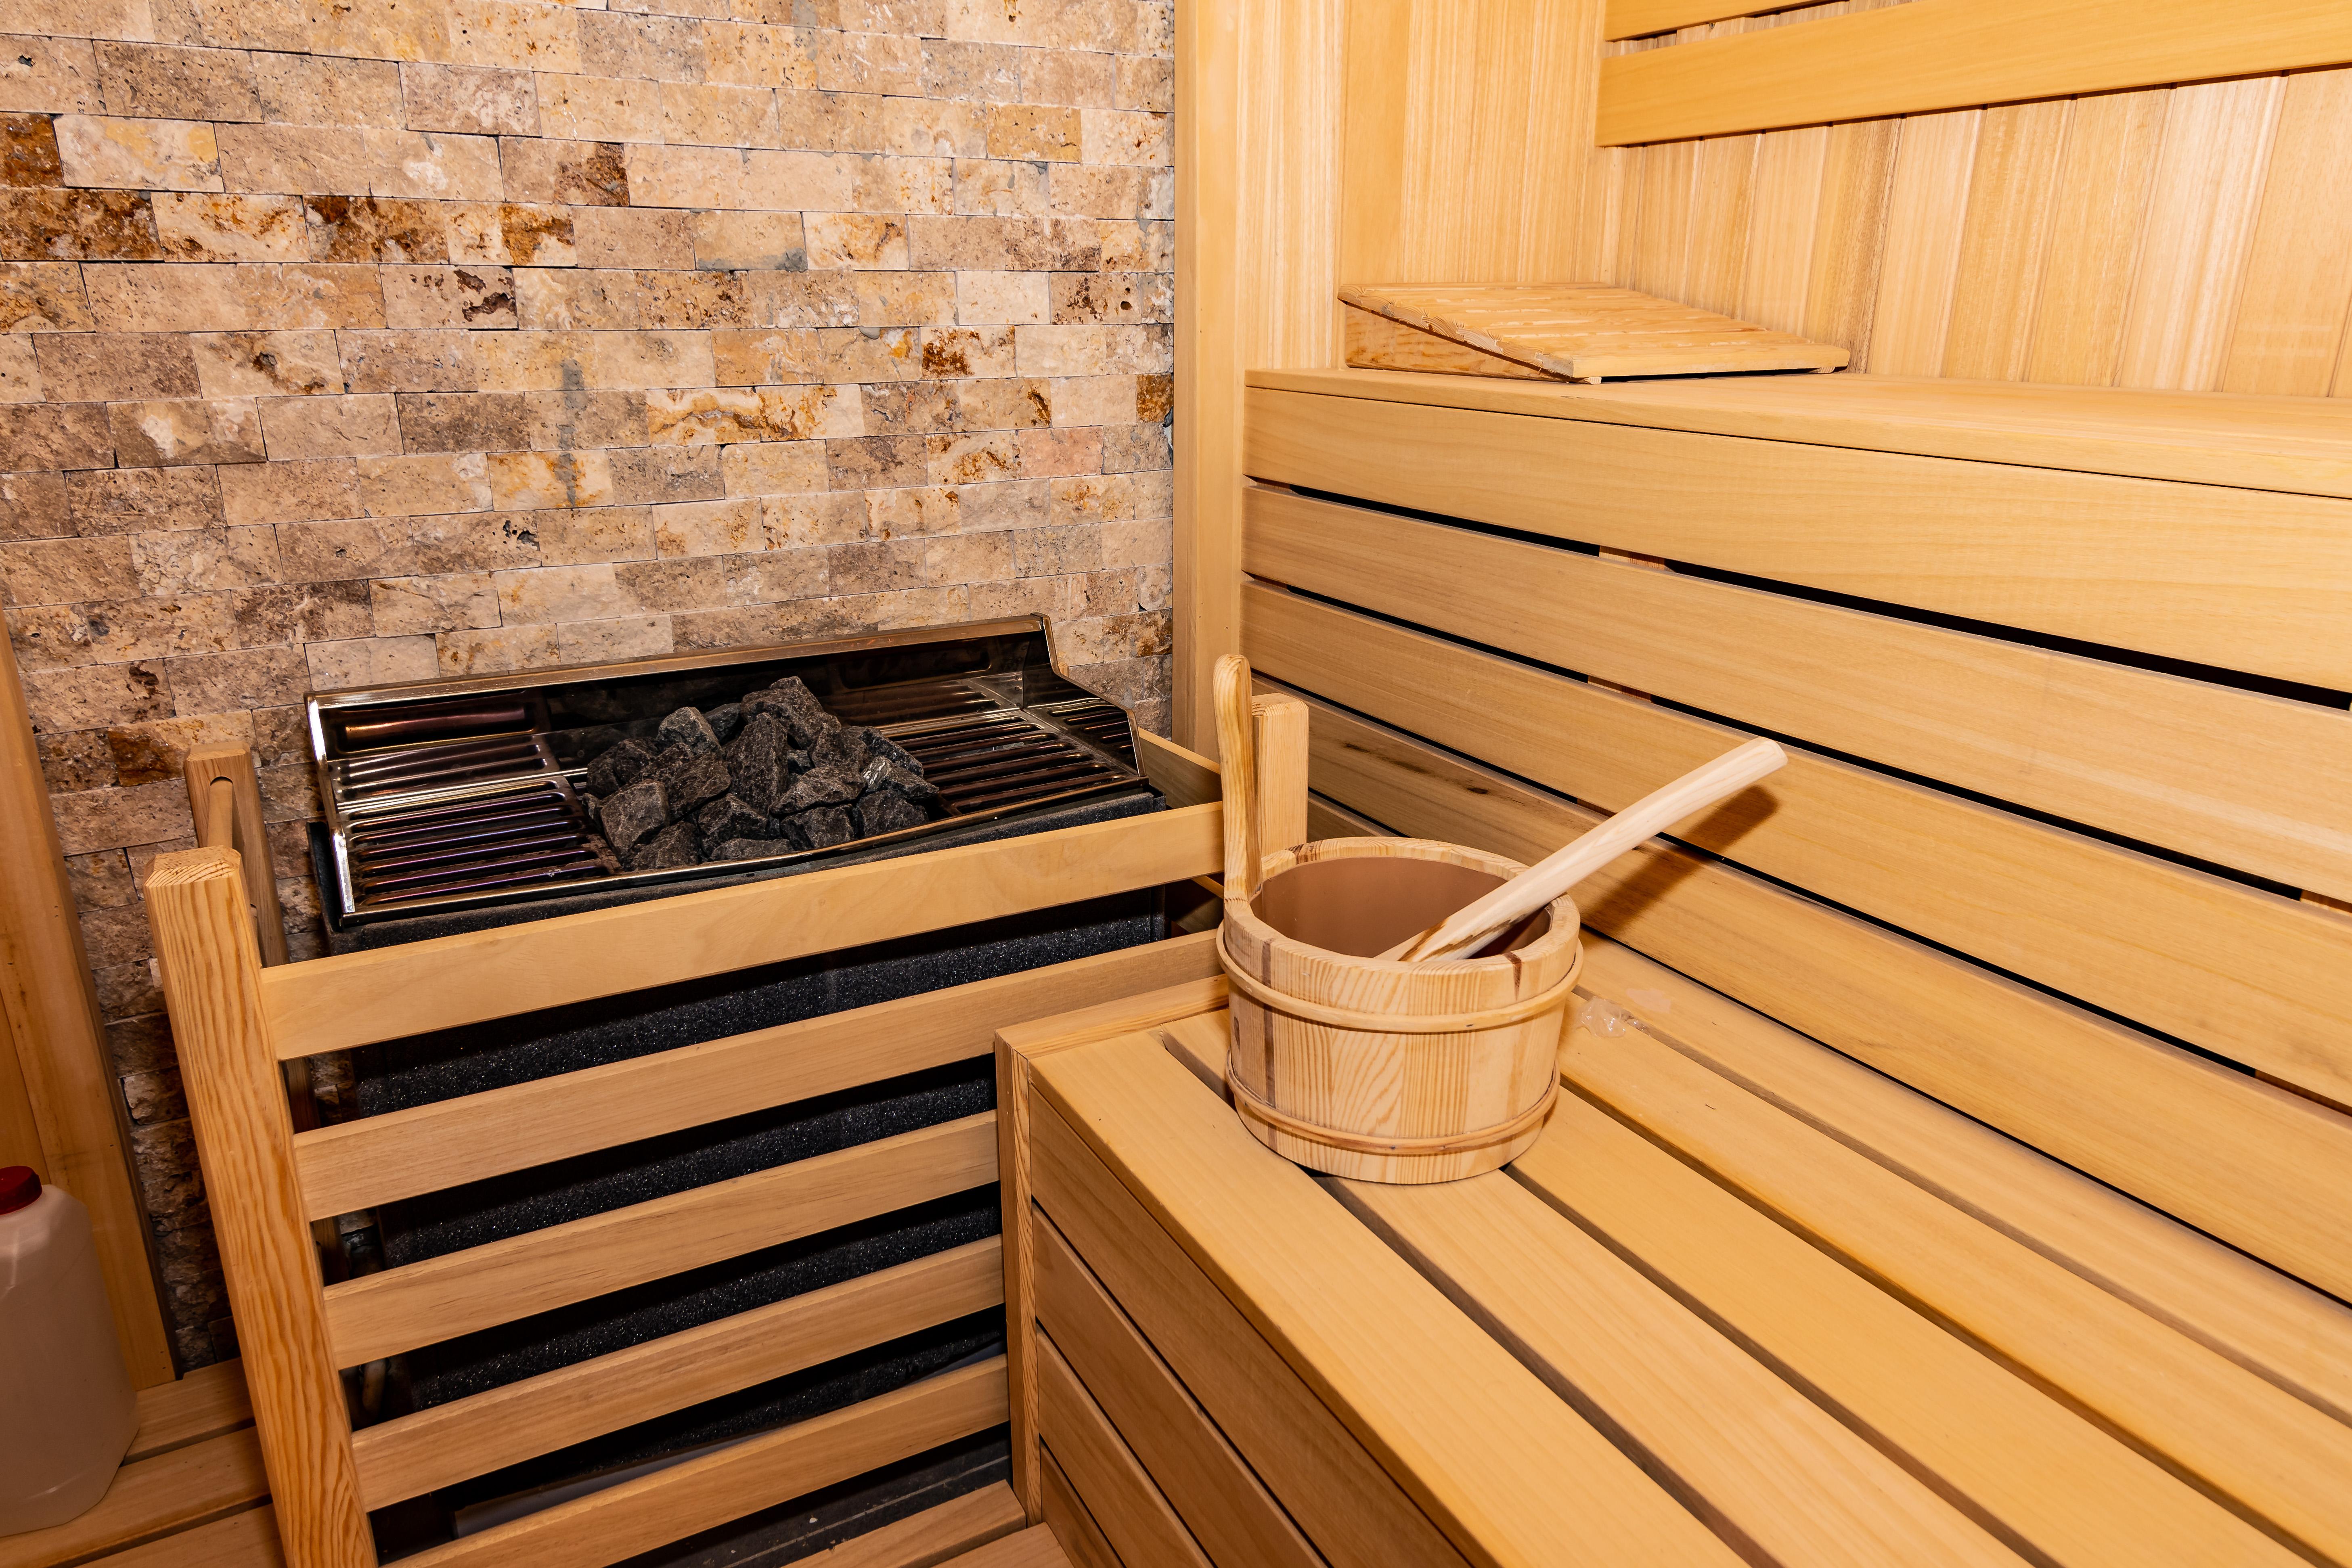 Apartment Joya Cyprus Starbright Garden Apartment photo 20238238